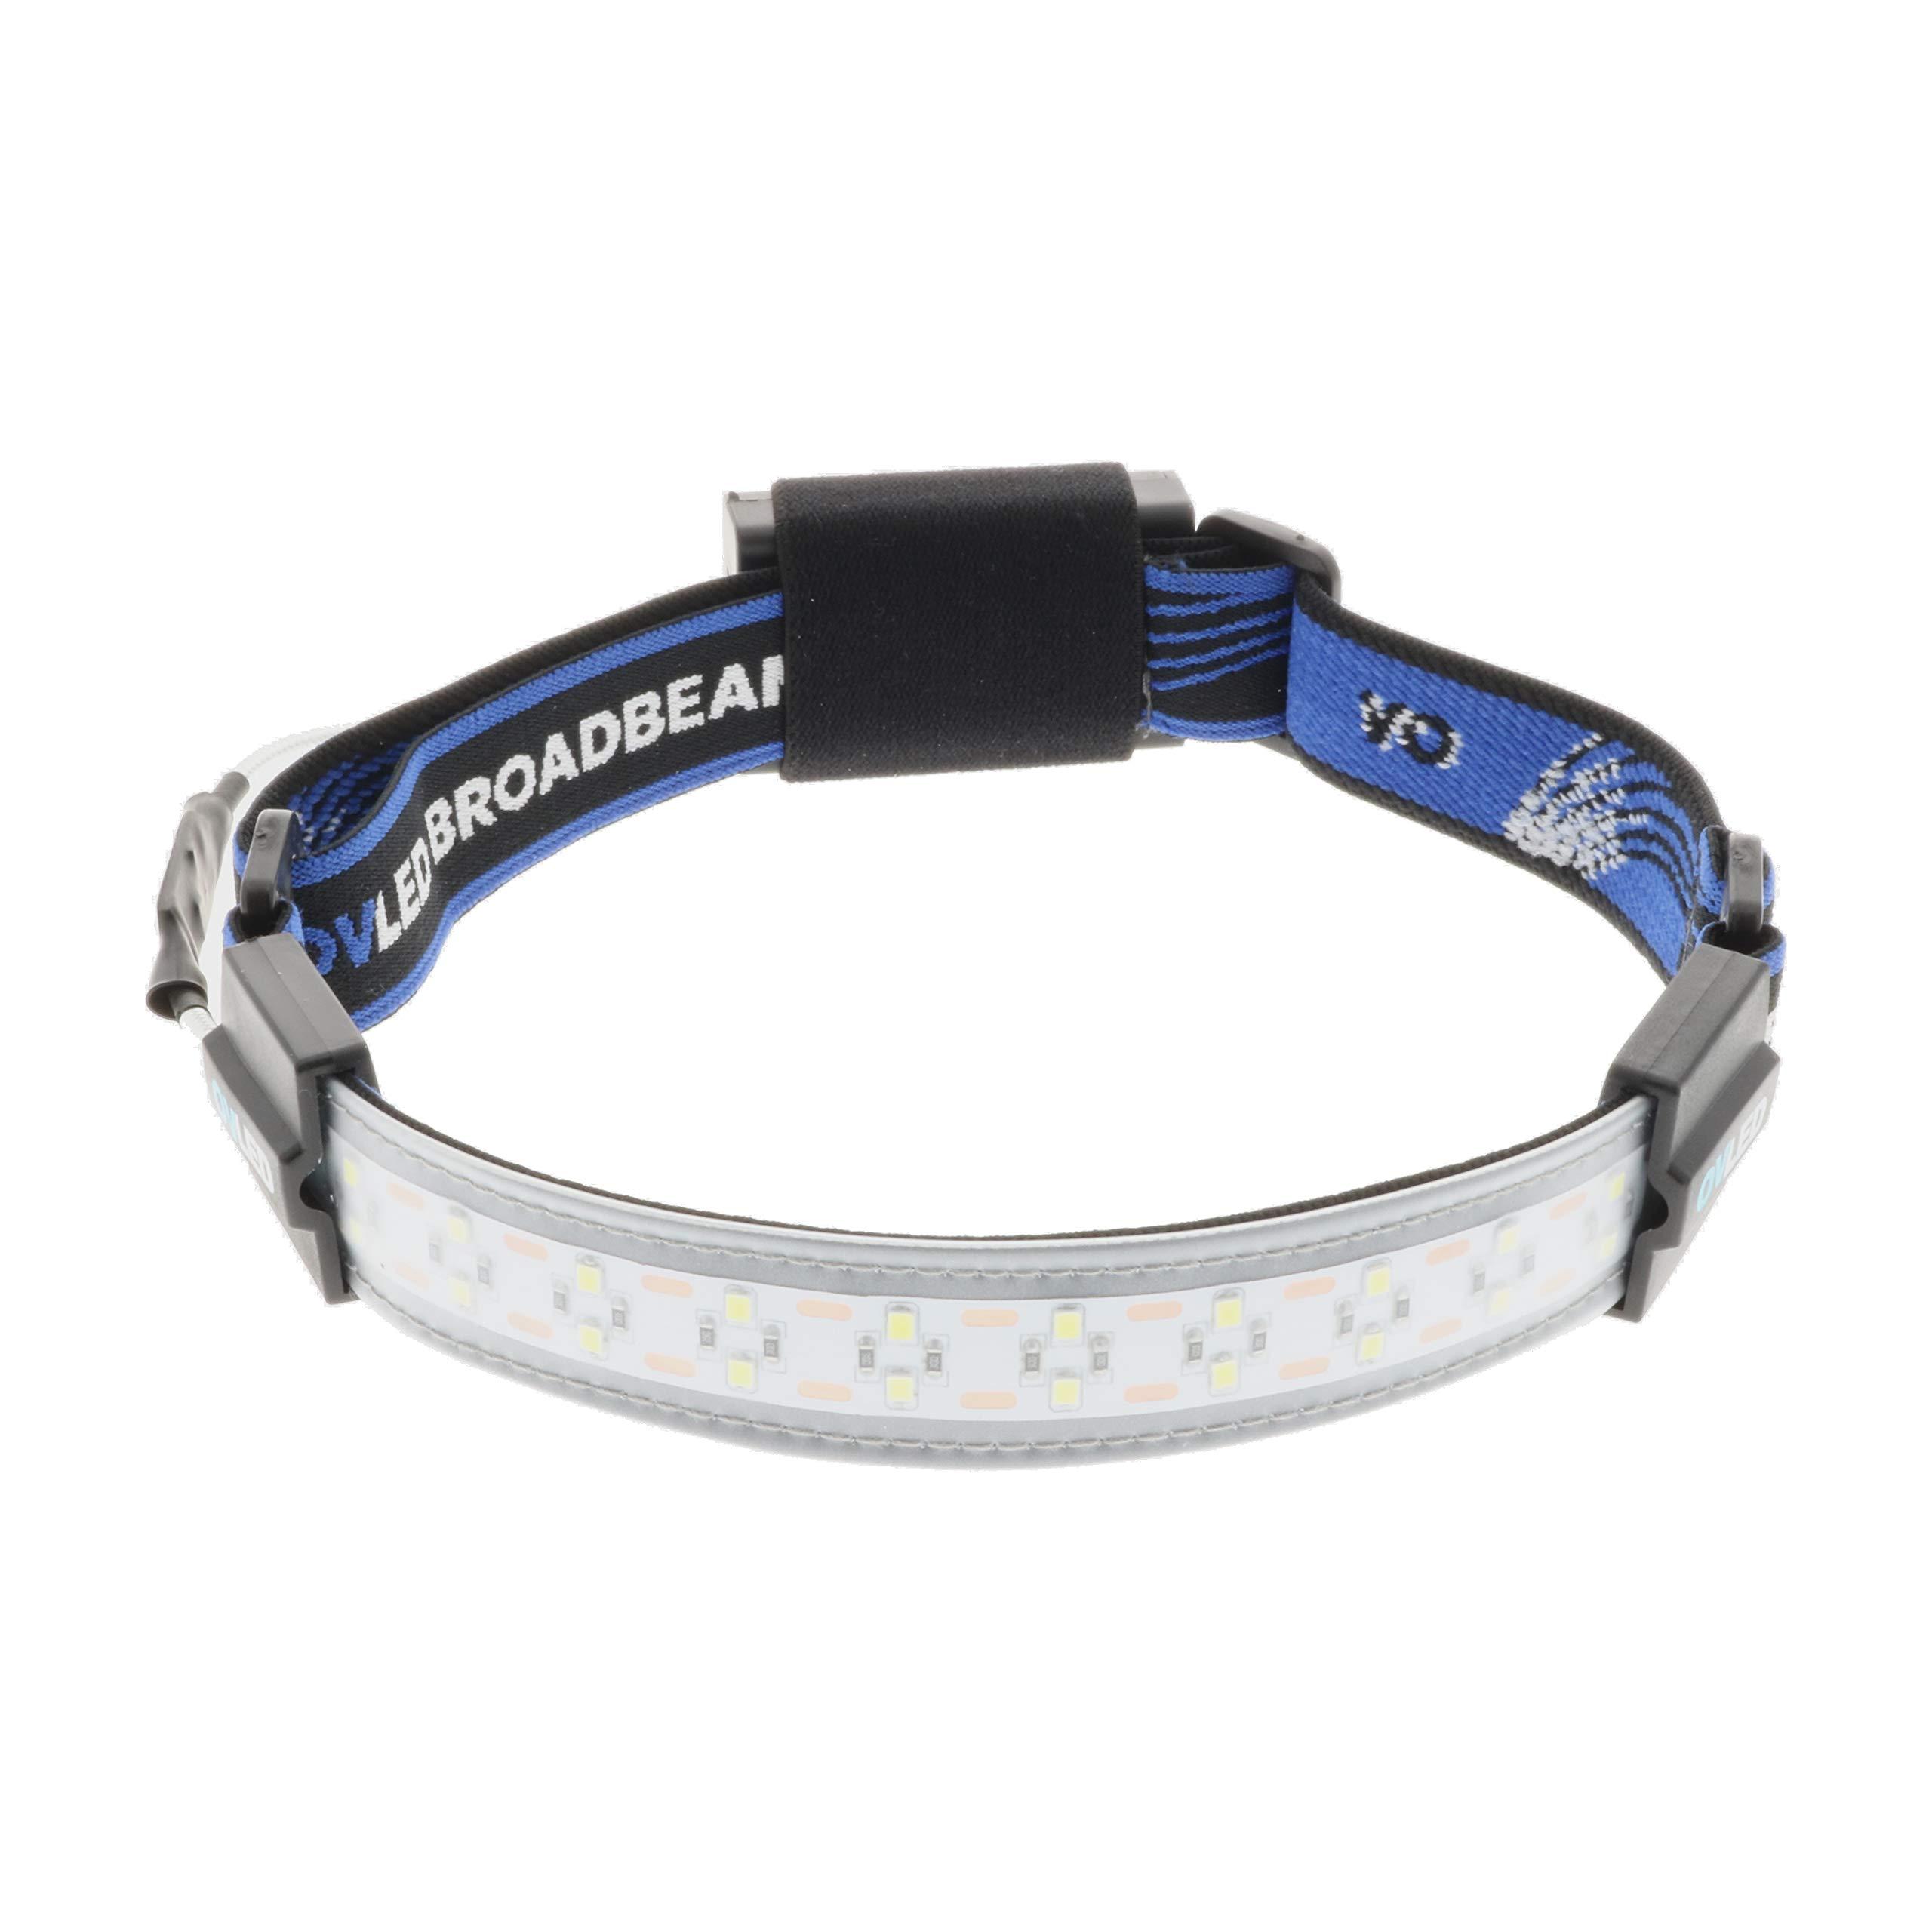 OV LED 802100 Broadbeam LED Headlamp, Ultra-Low Profile Durable Elastic Headband, Camping, Hunting, Runners, Hiking, Outdoors, Fishing, 210° Illumination, 300 Lumens, 20 Bright LED Lights, 3 AAA Battery Powered, 3 Power Settings by Optimal Ventures